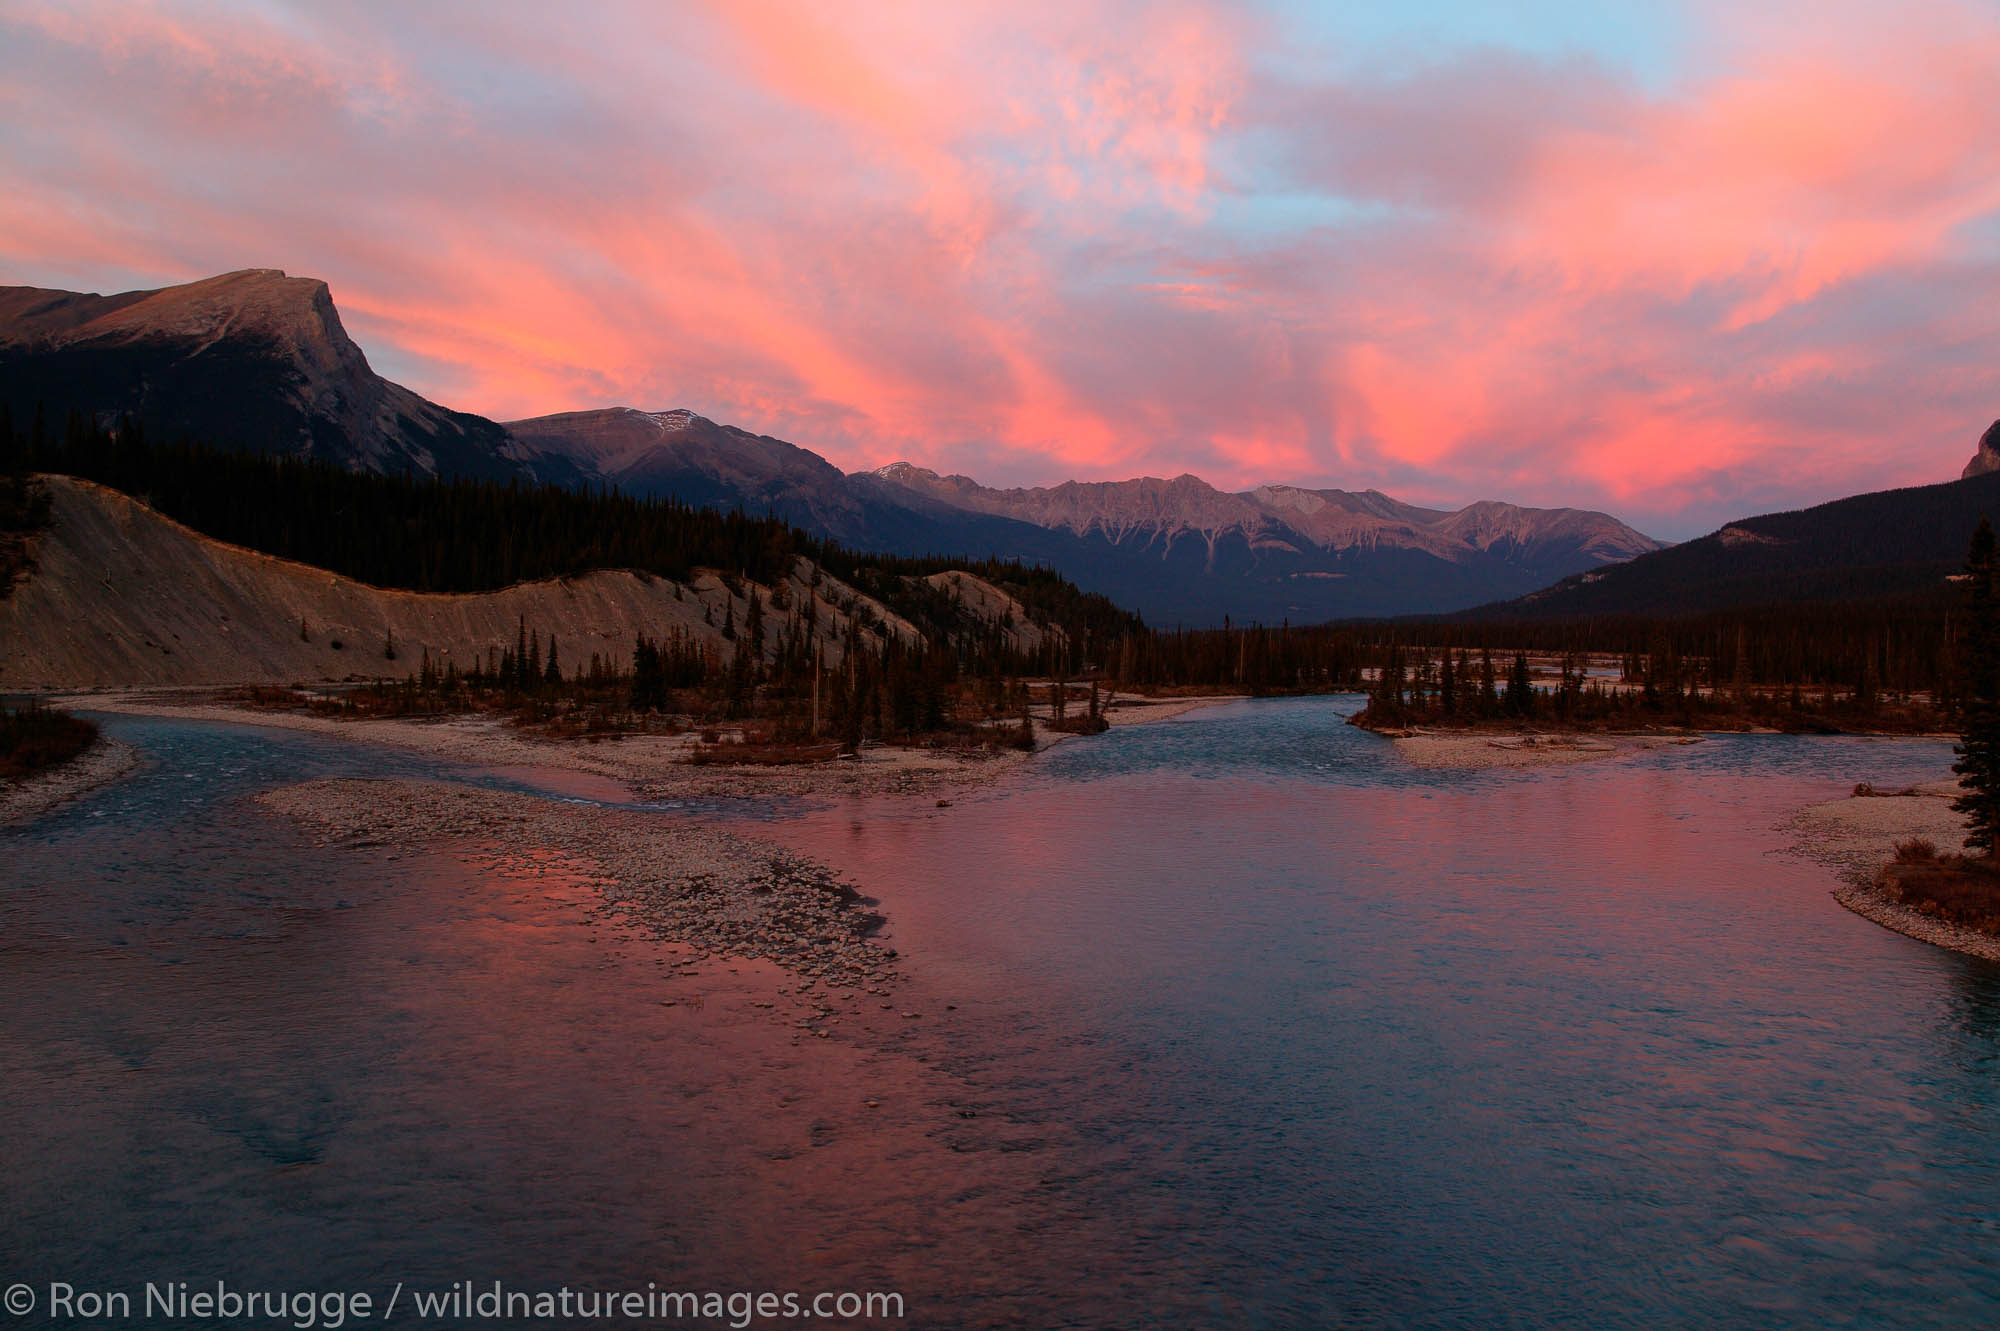 Saskatchewan River at sunset, Banff National Park, Alberta, Canada.